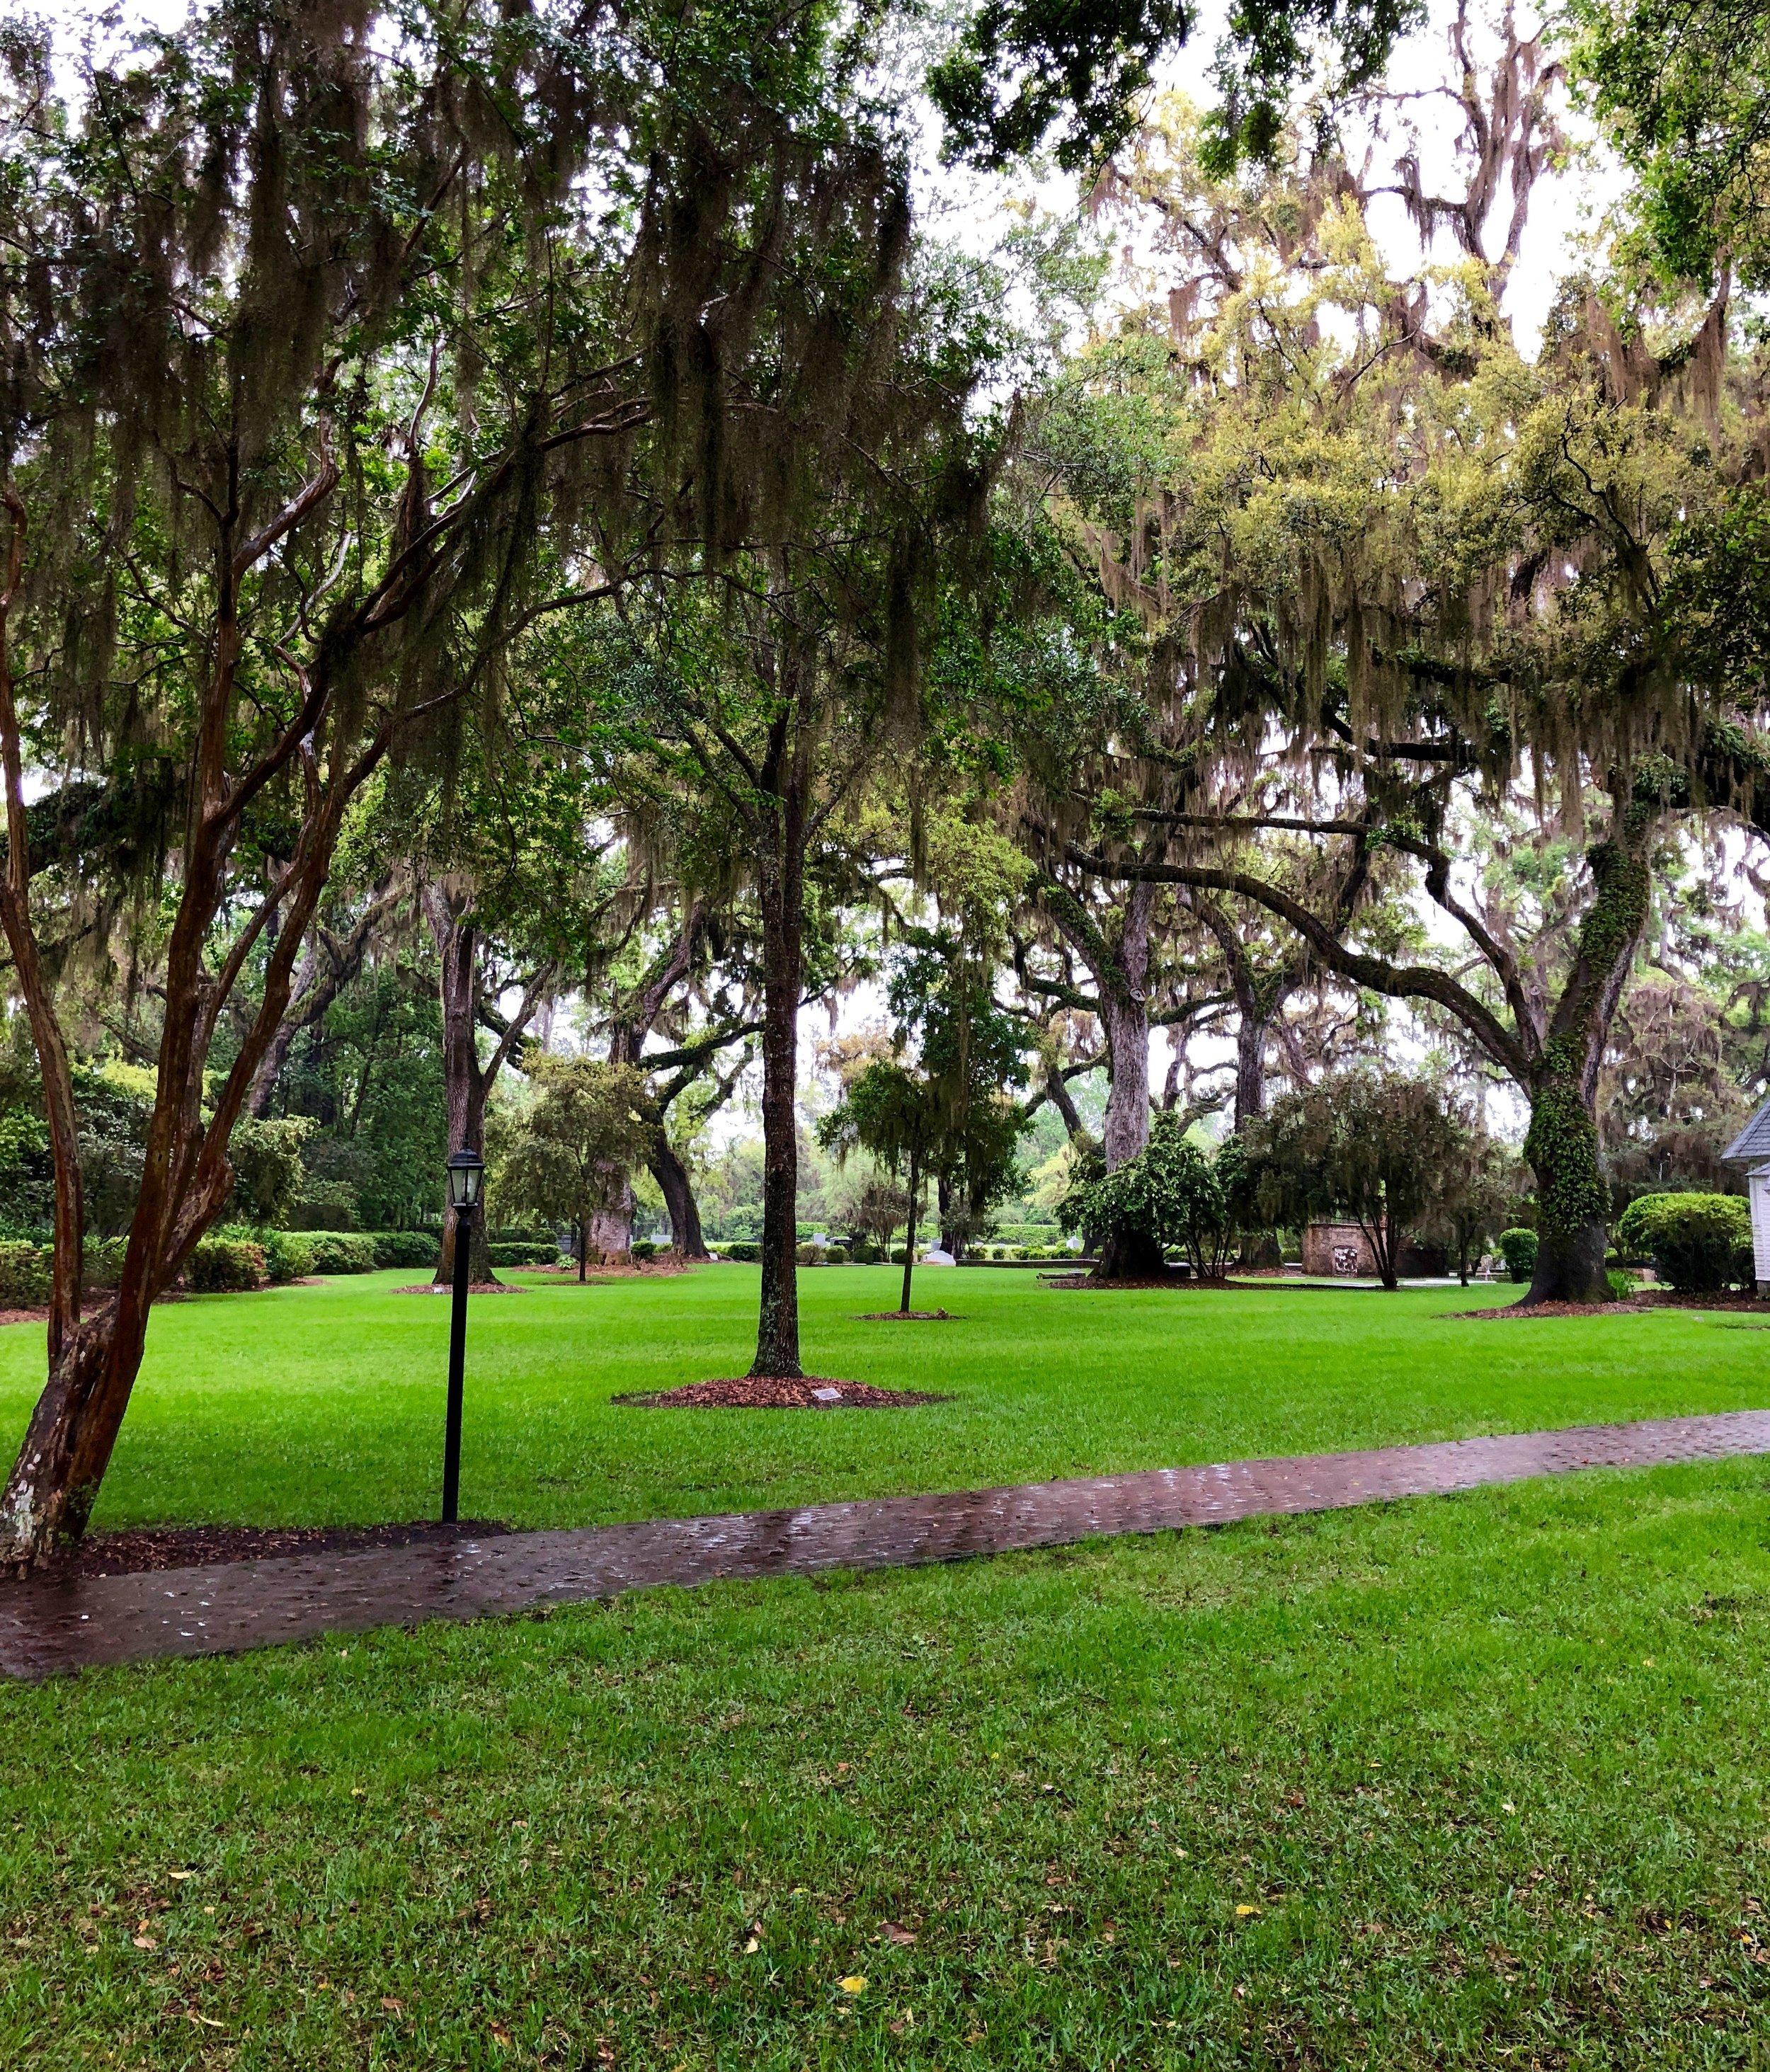 trees-grass-rain.jpg